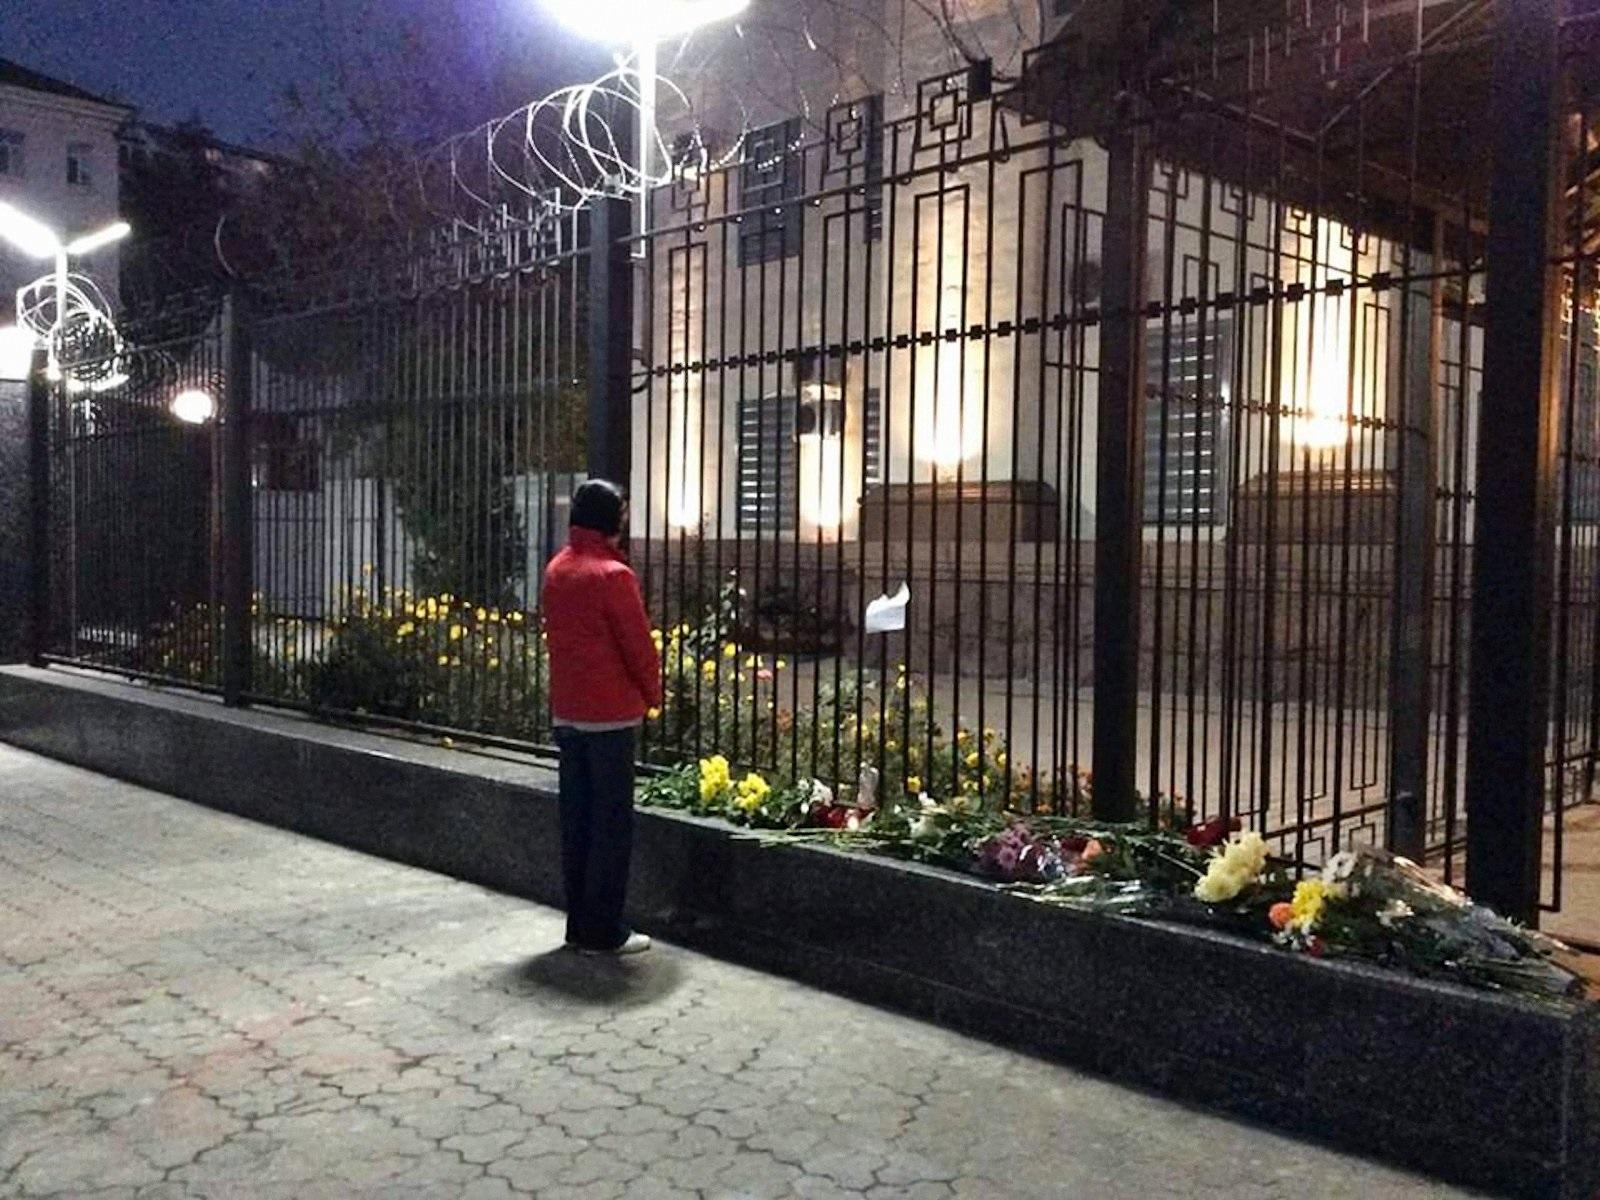 00 kiev embassy russia airliner crash 05 311015